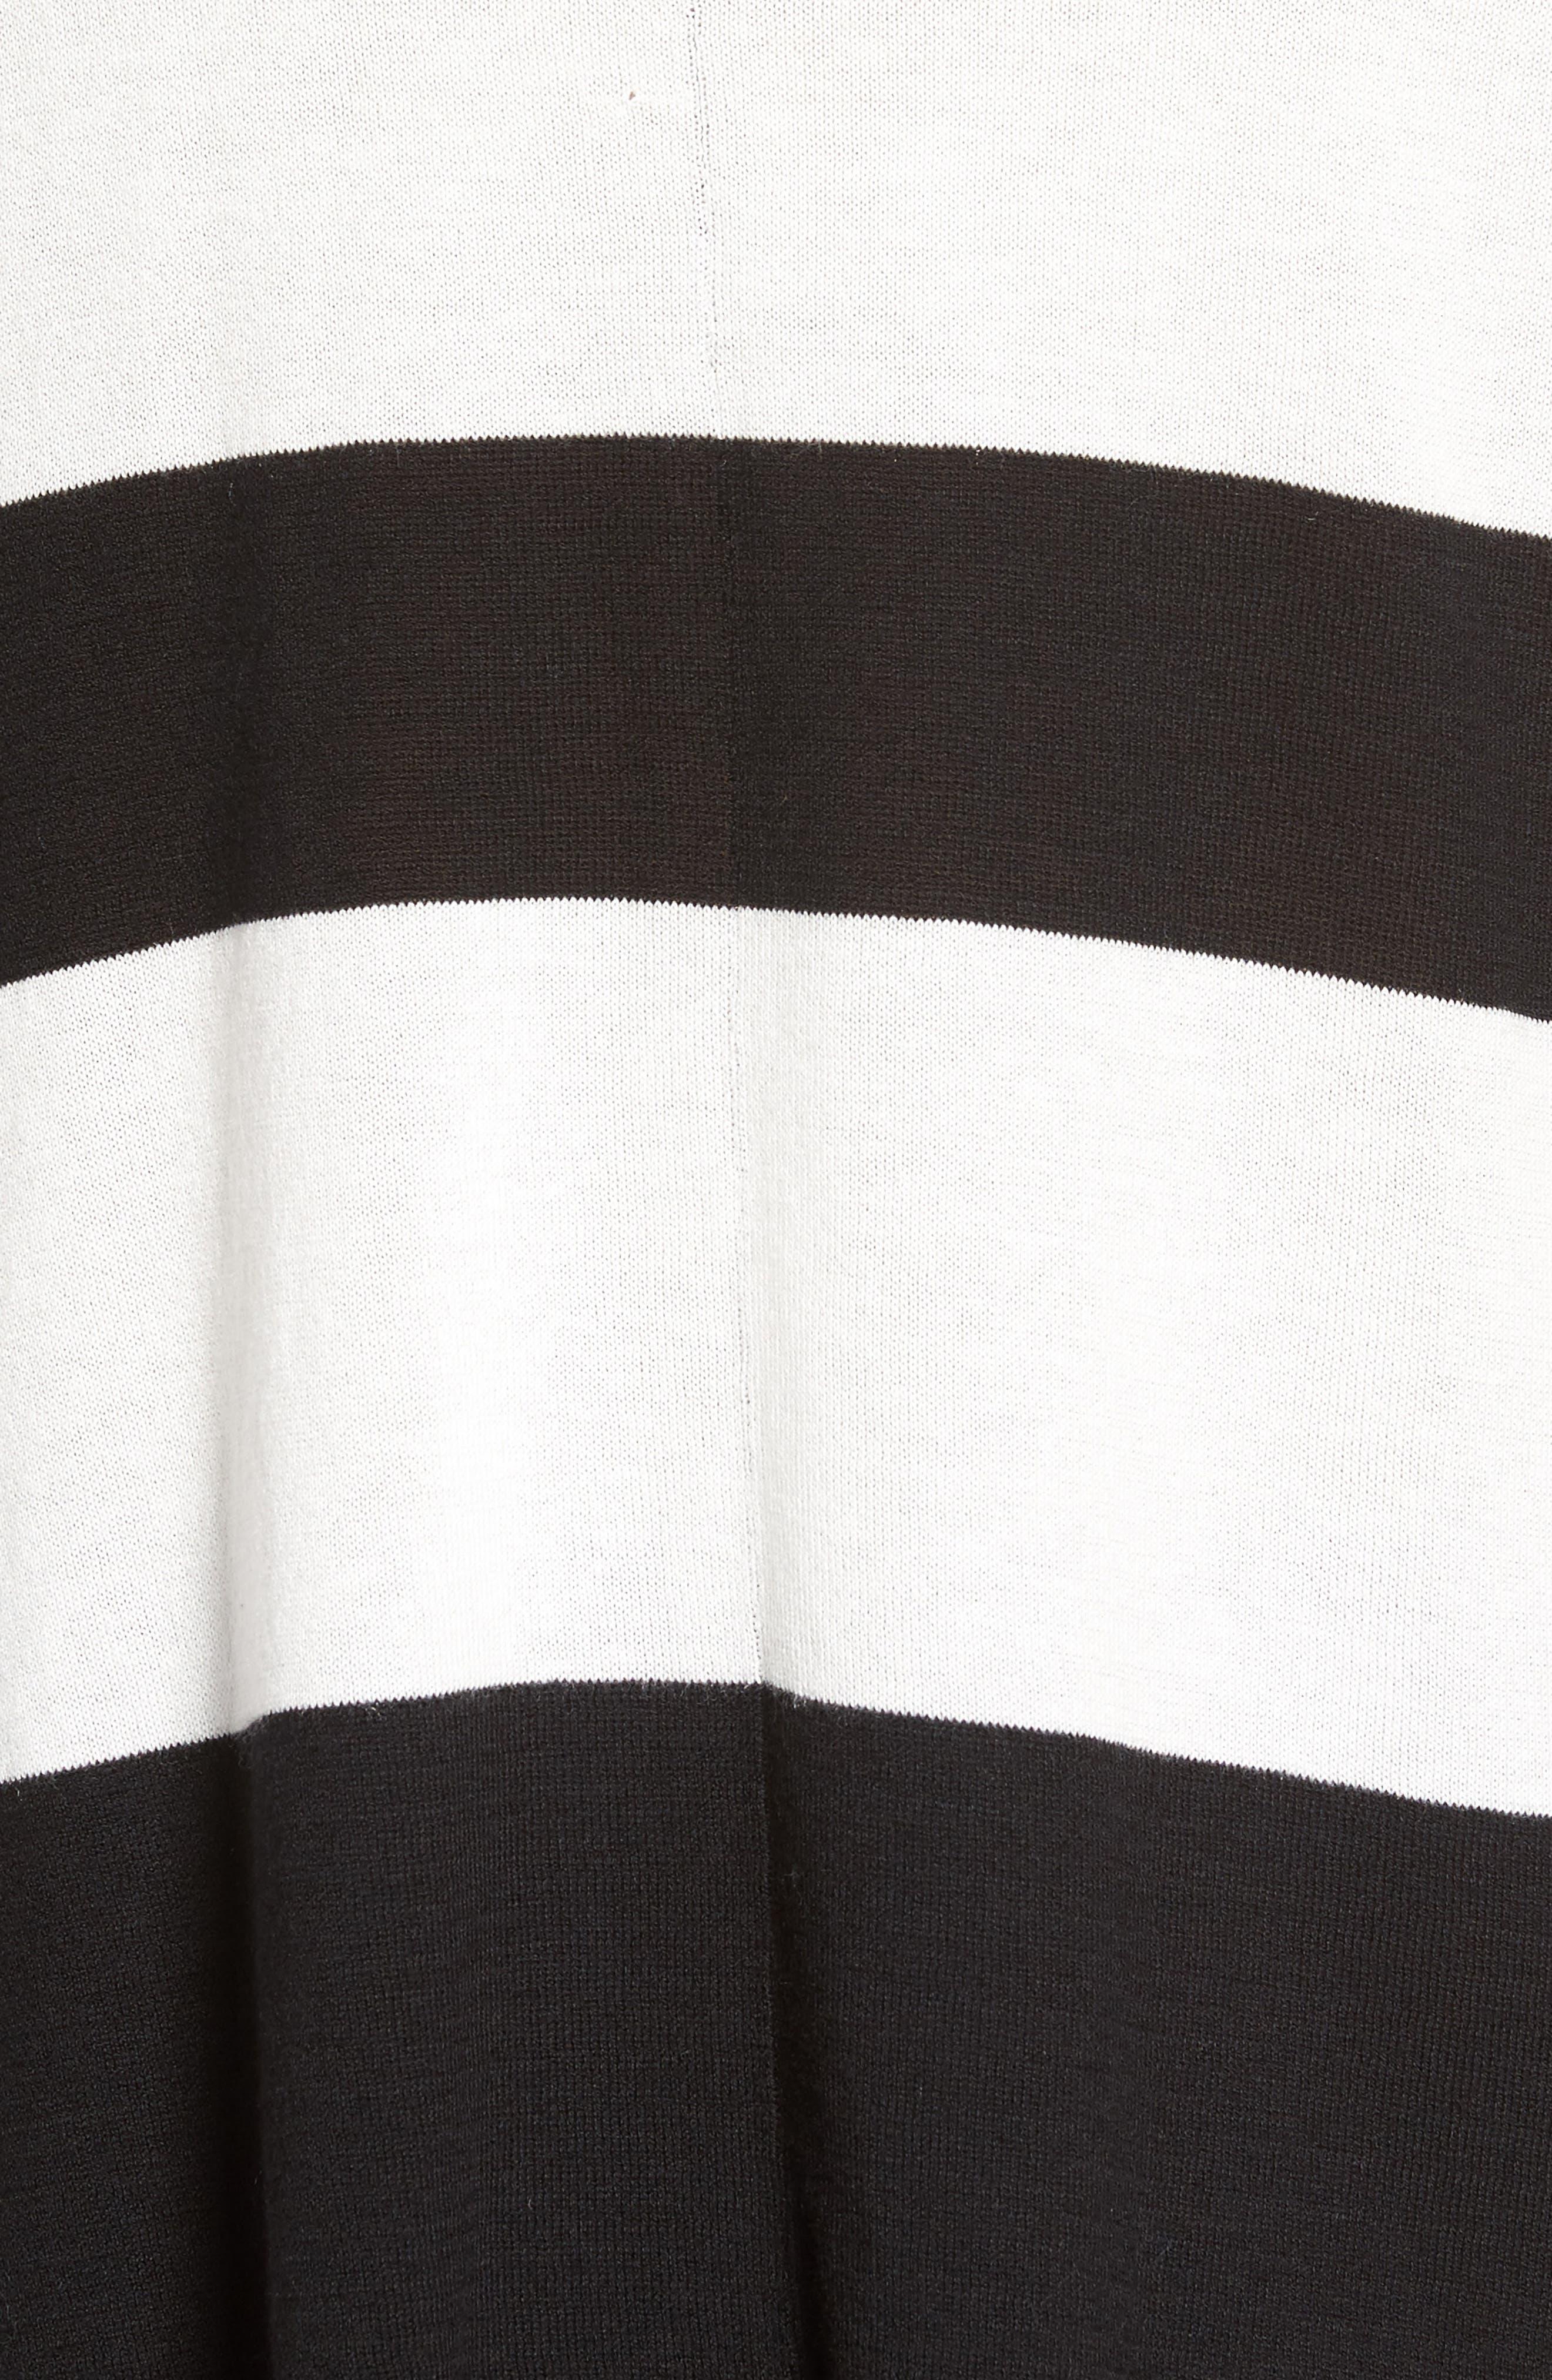 Wide Stripe Turtleneck Sweater,                             Alternate thumbnail 5, color,                             001